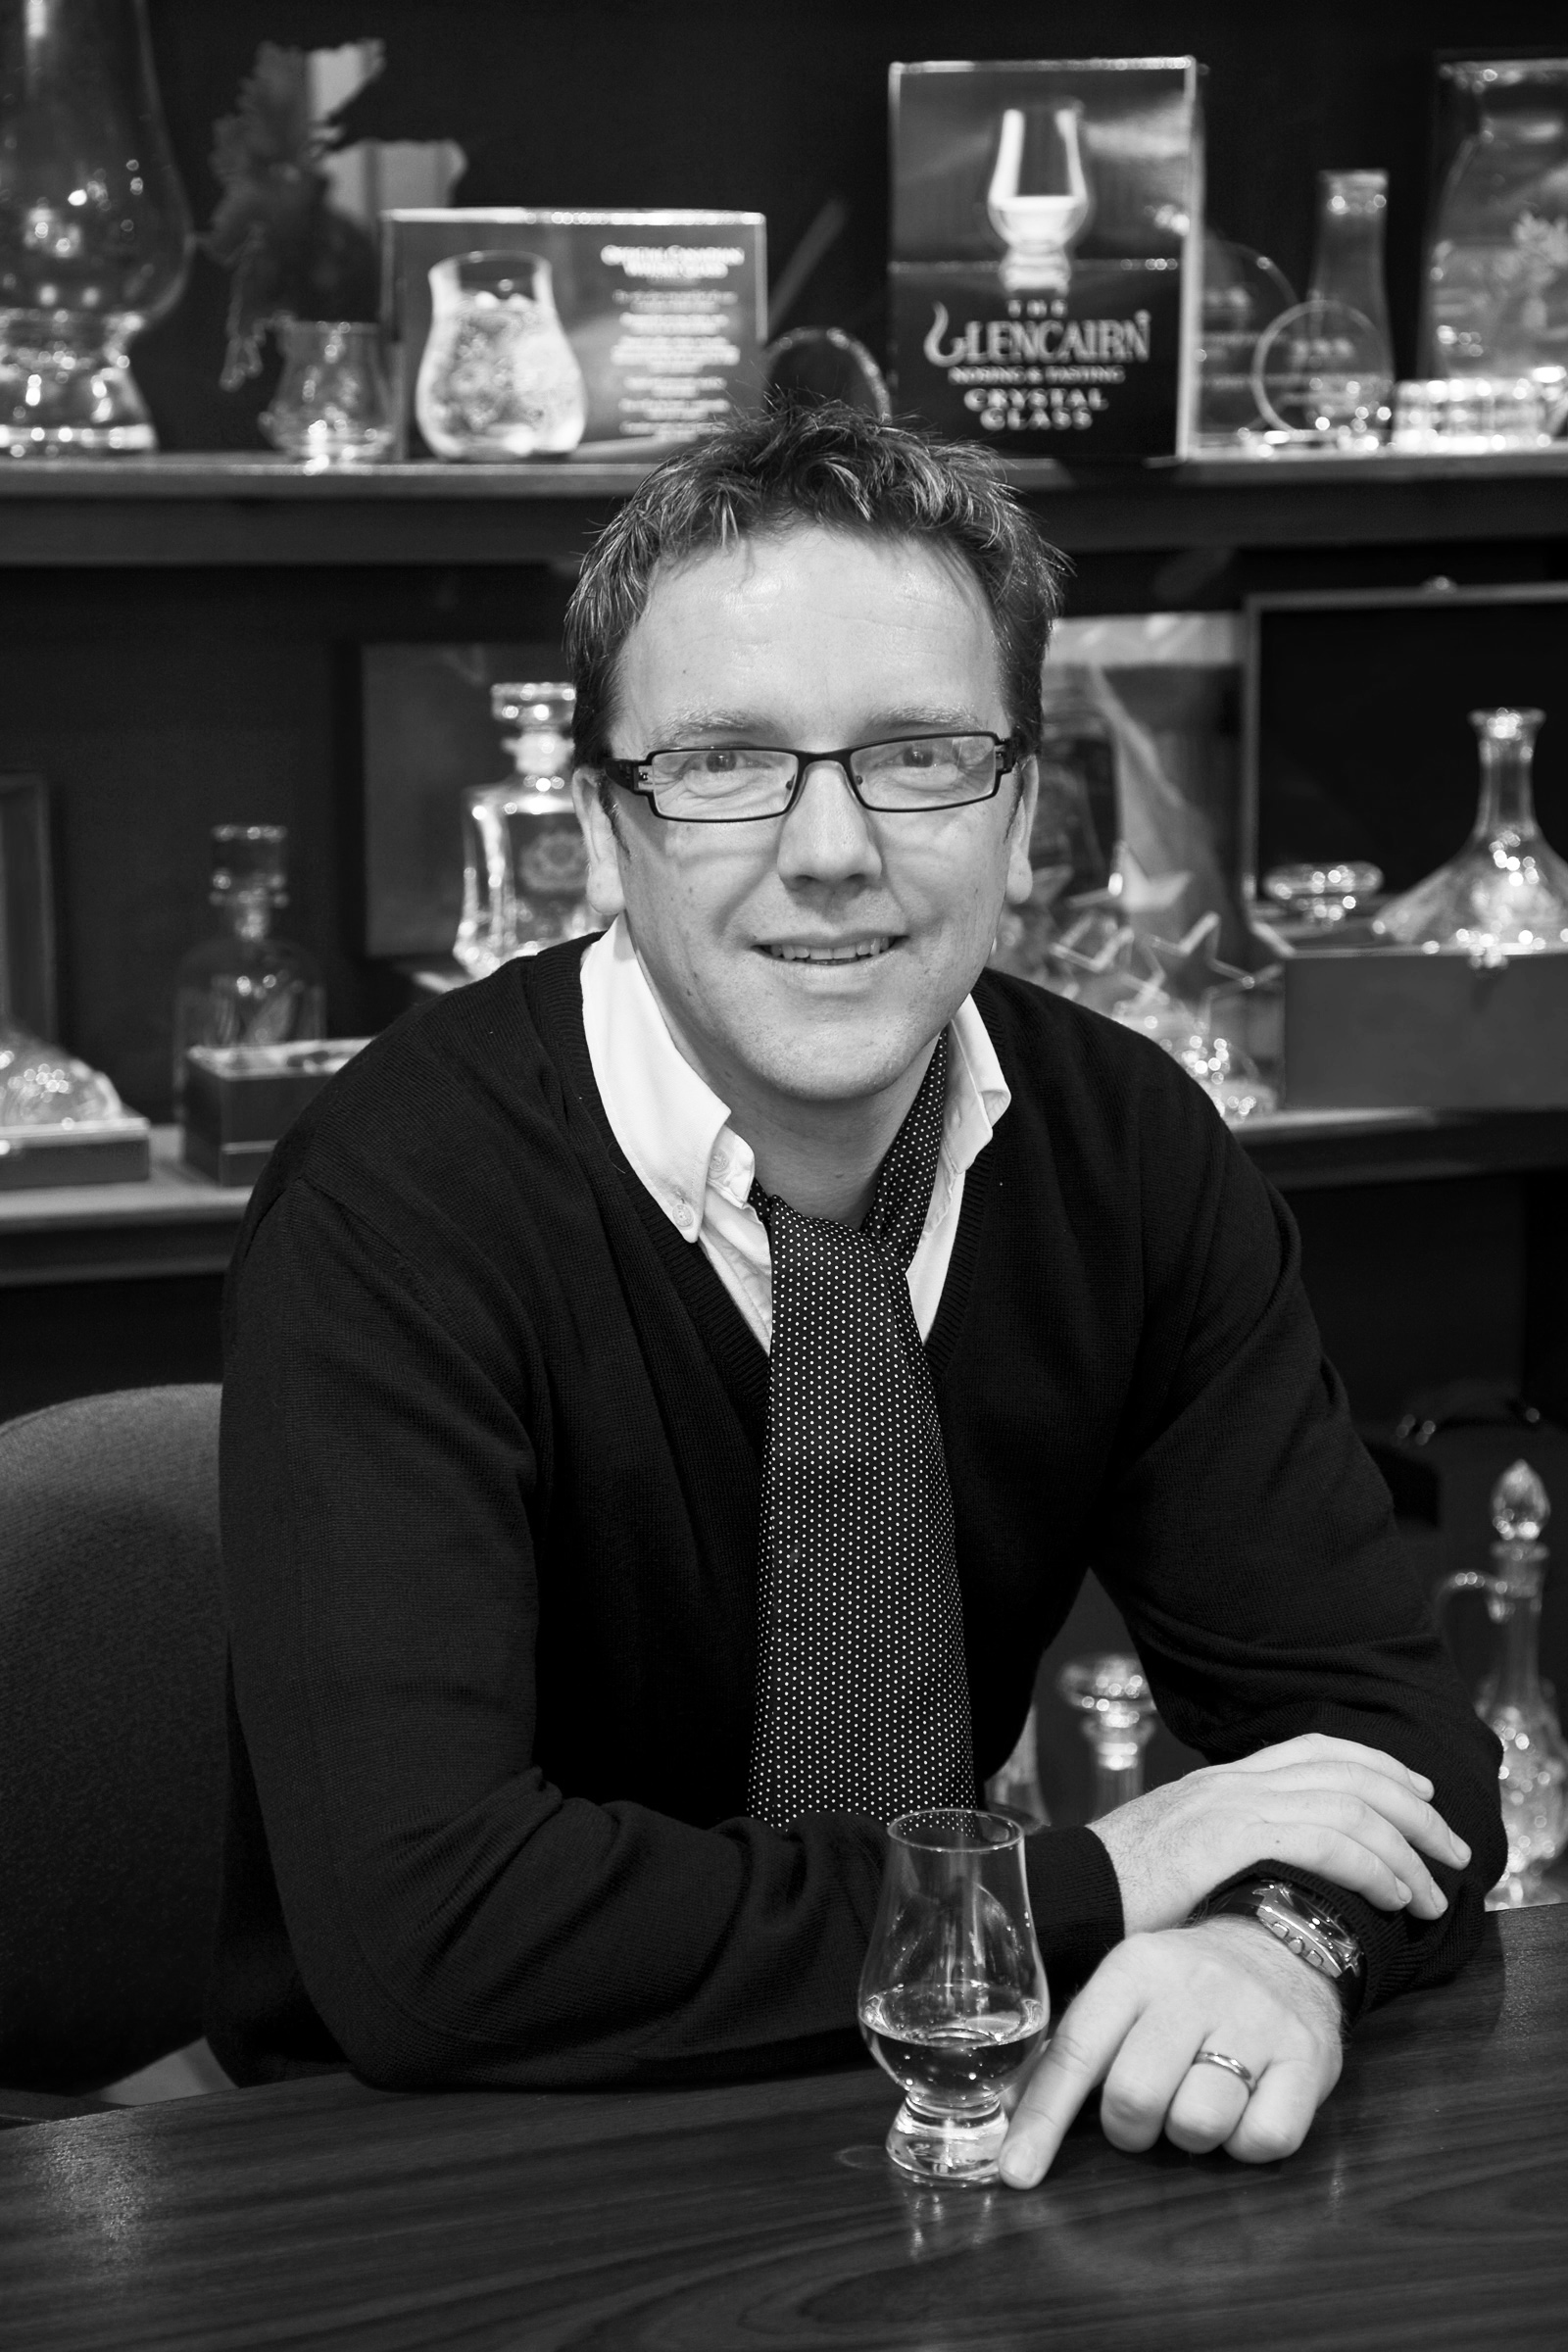 Paul Davidson - Managing Director of Glencairn Crystal